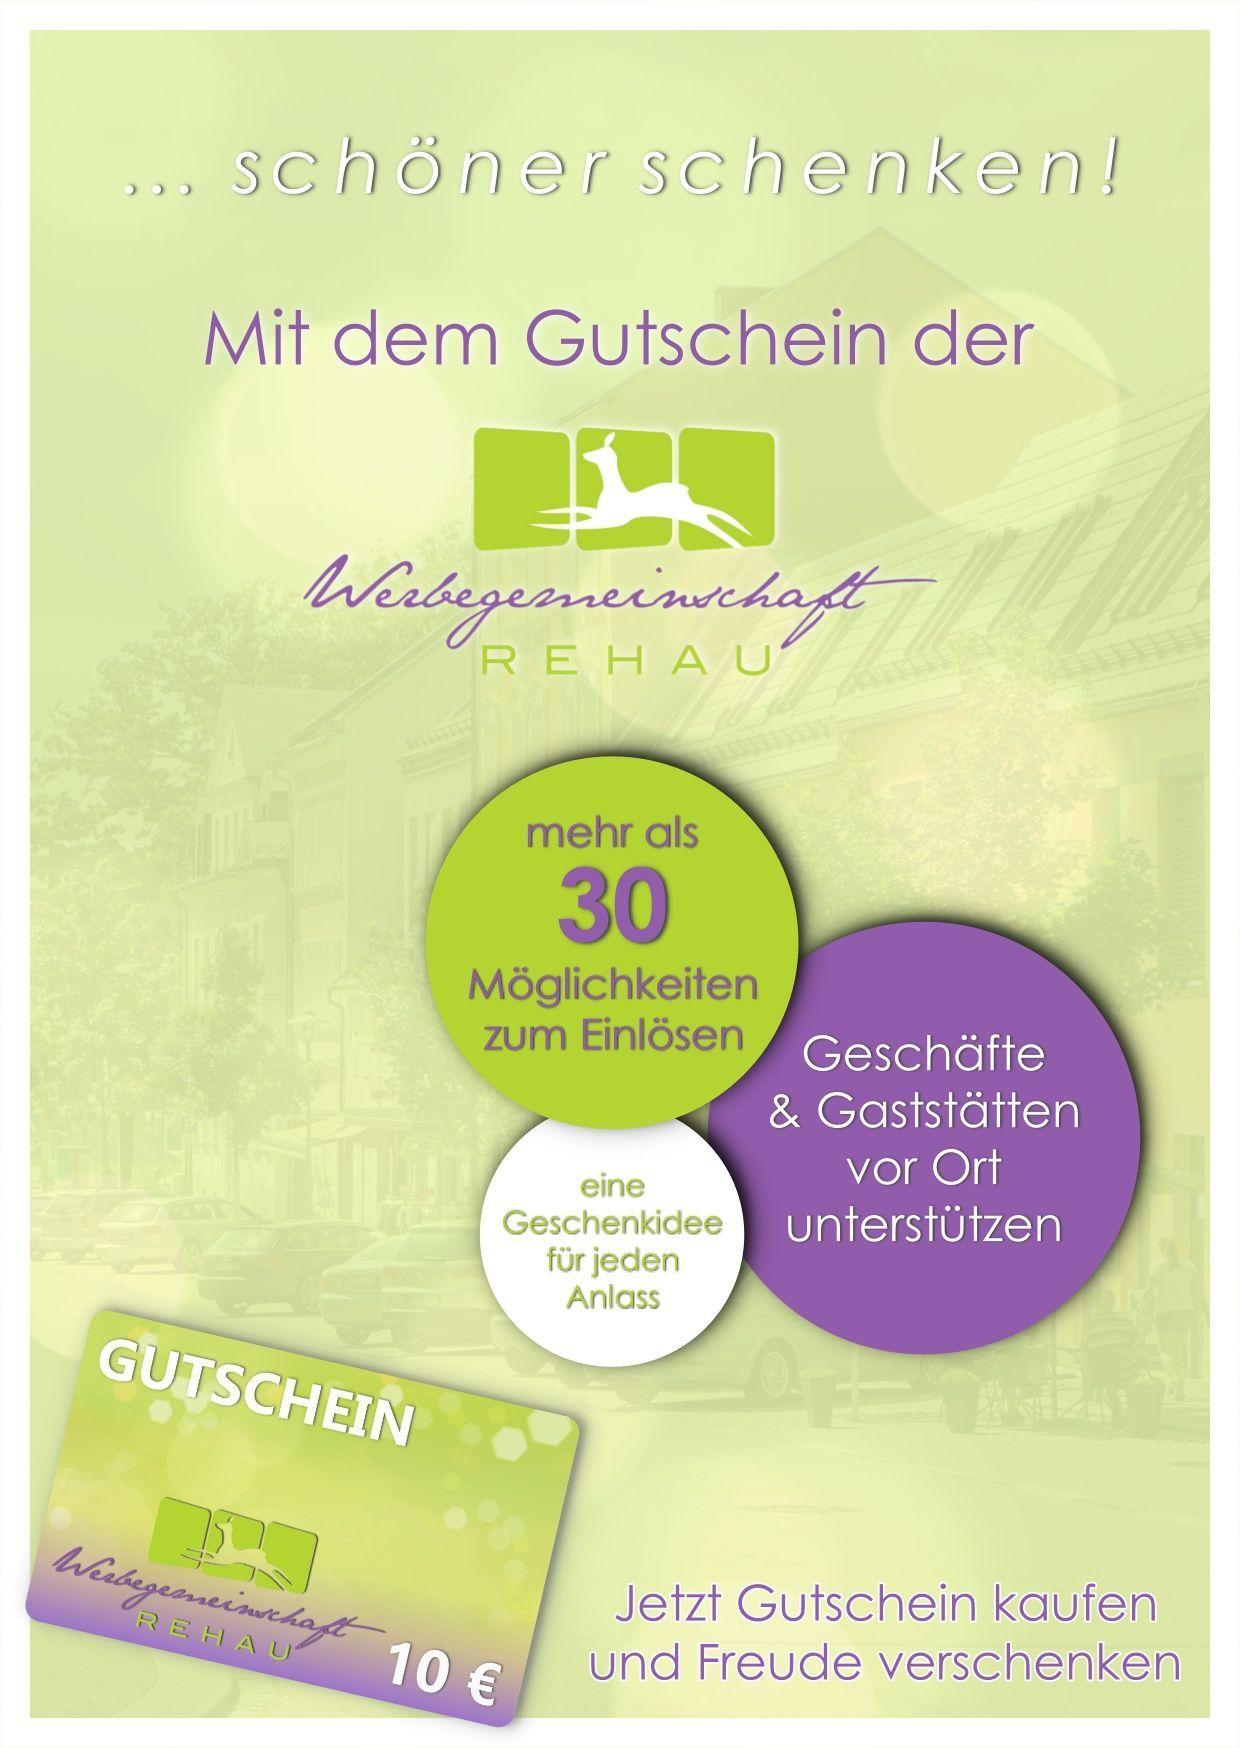 Hubertus Apotheke - Gutschein-Annahmestellen: